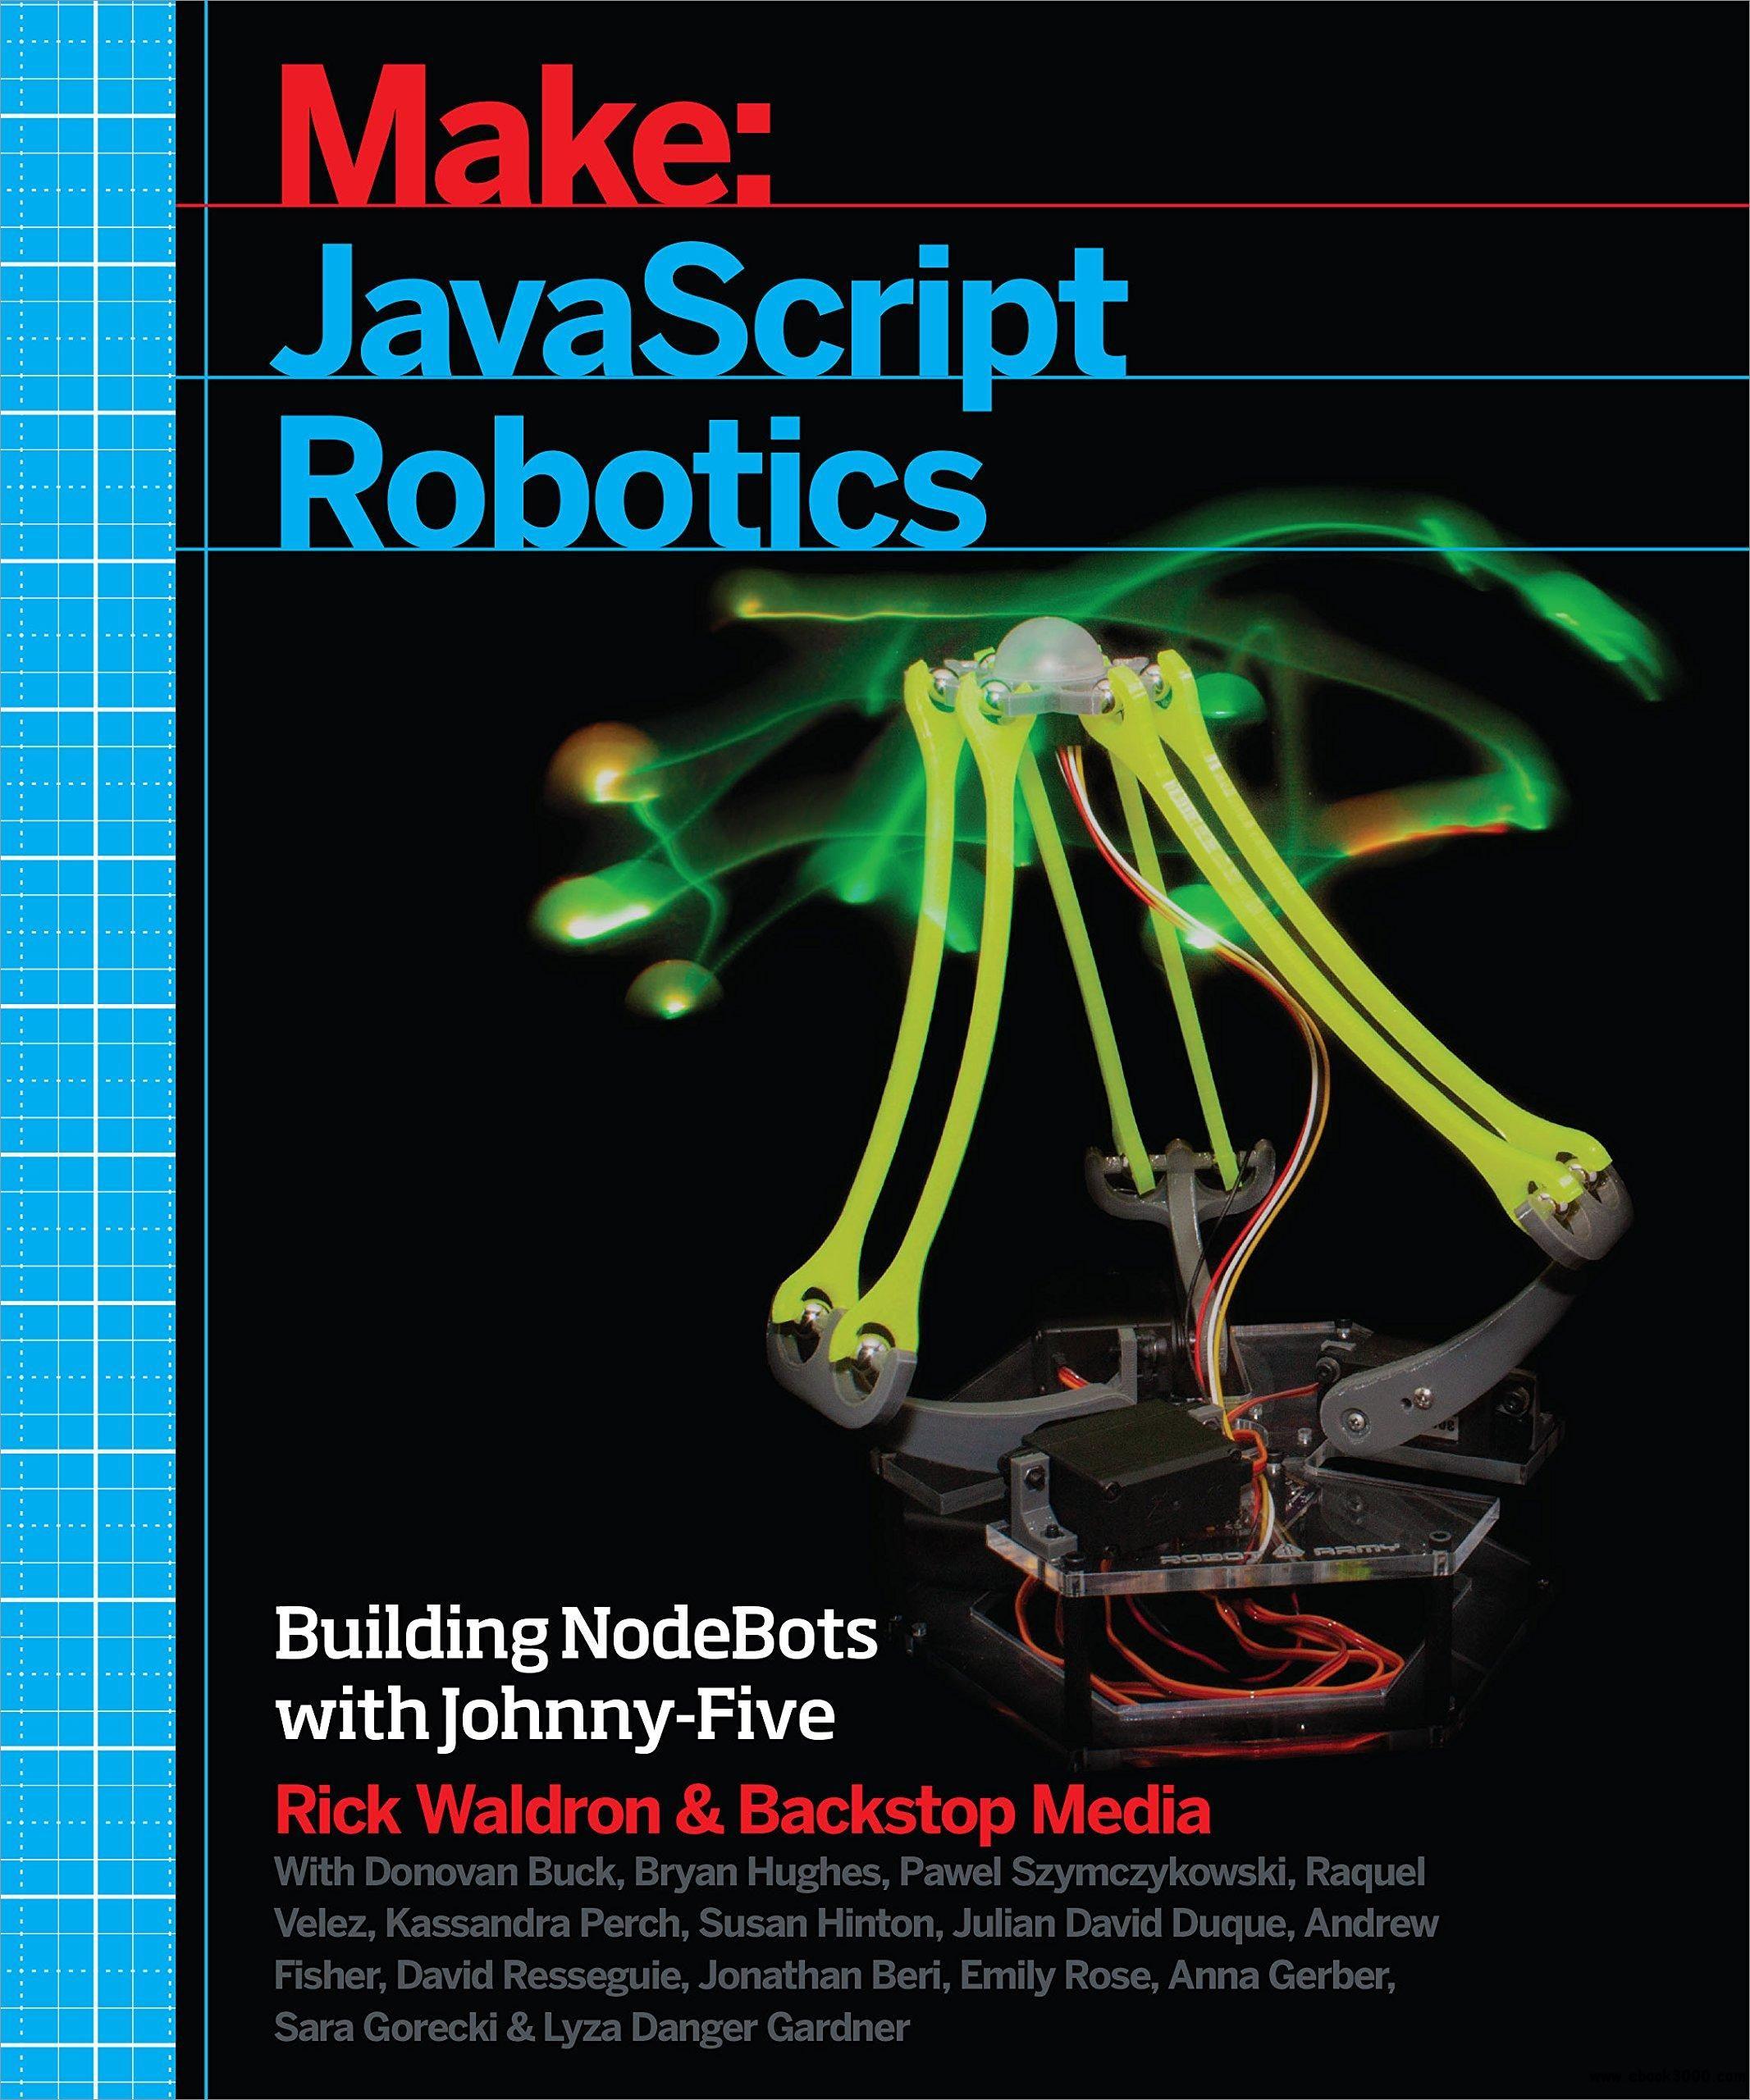 Make Javascript Robotics Free Ebooks Download Robot Arms